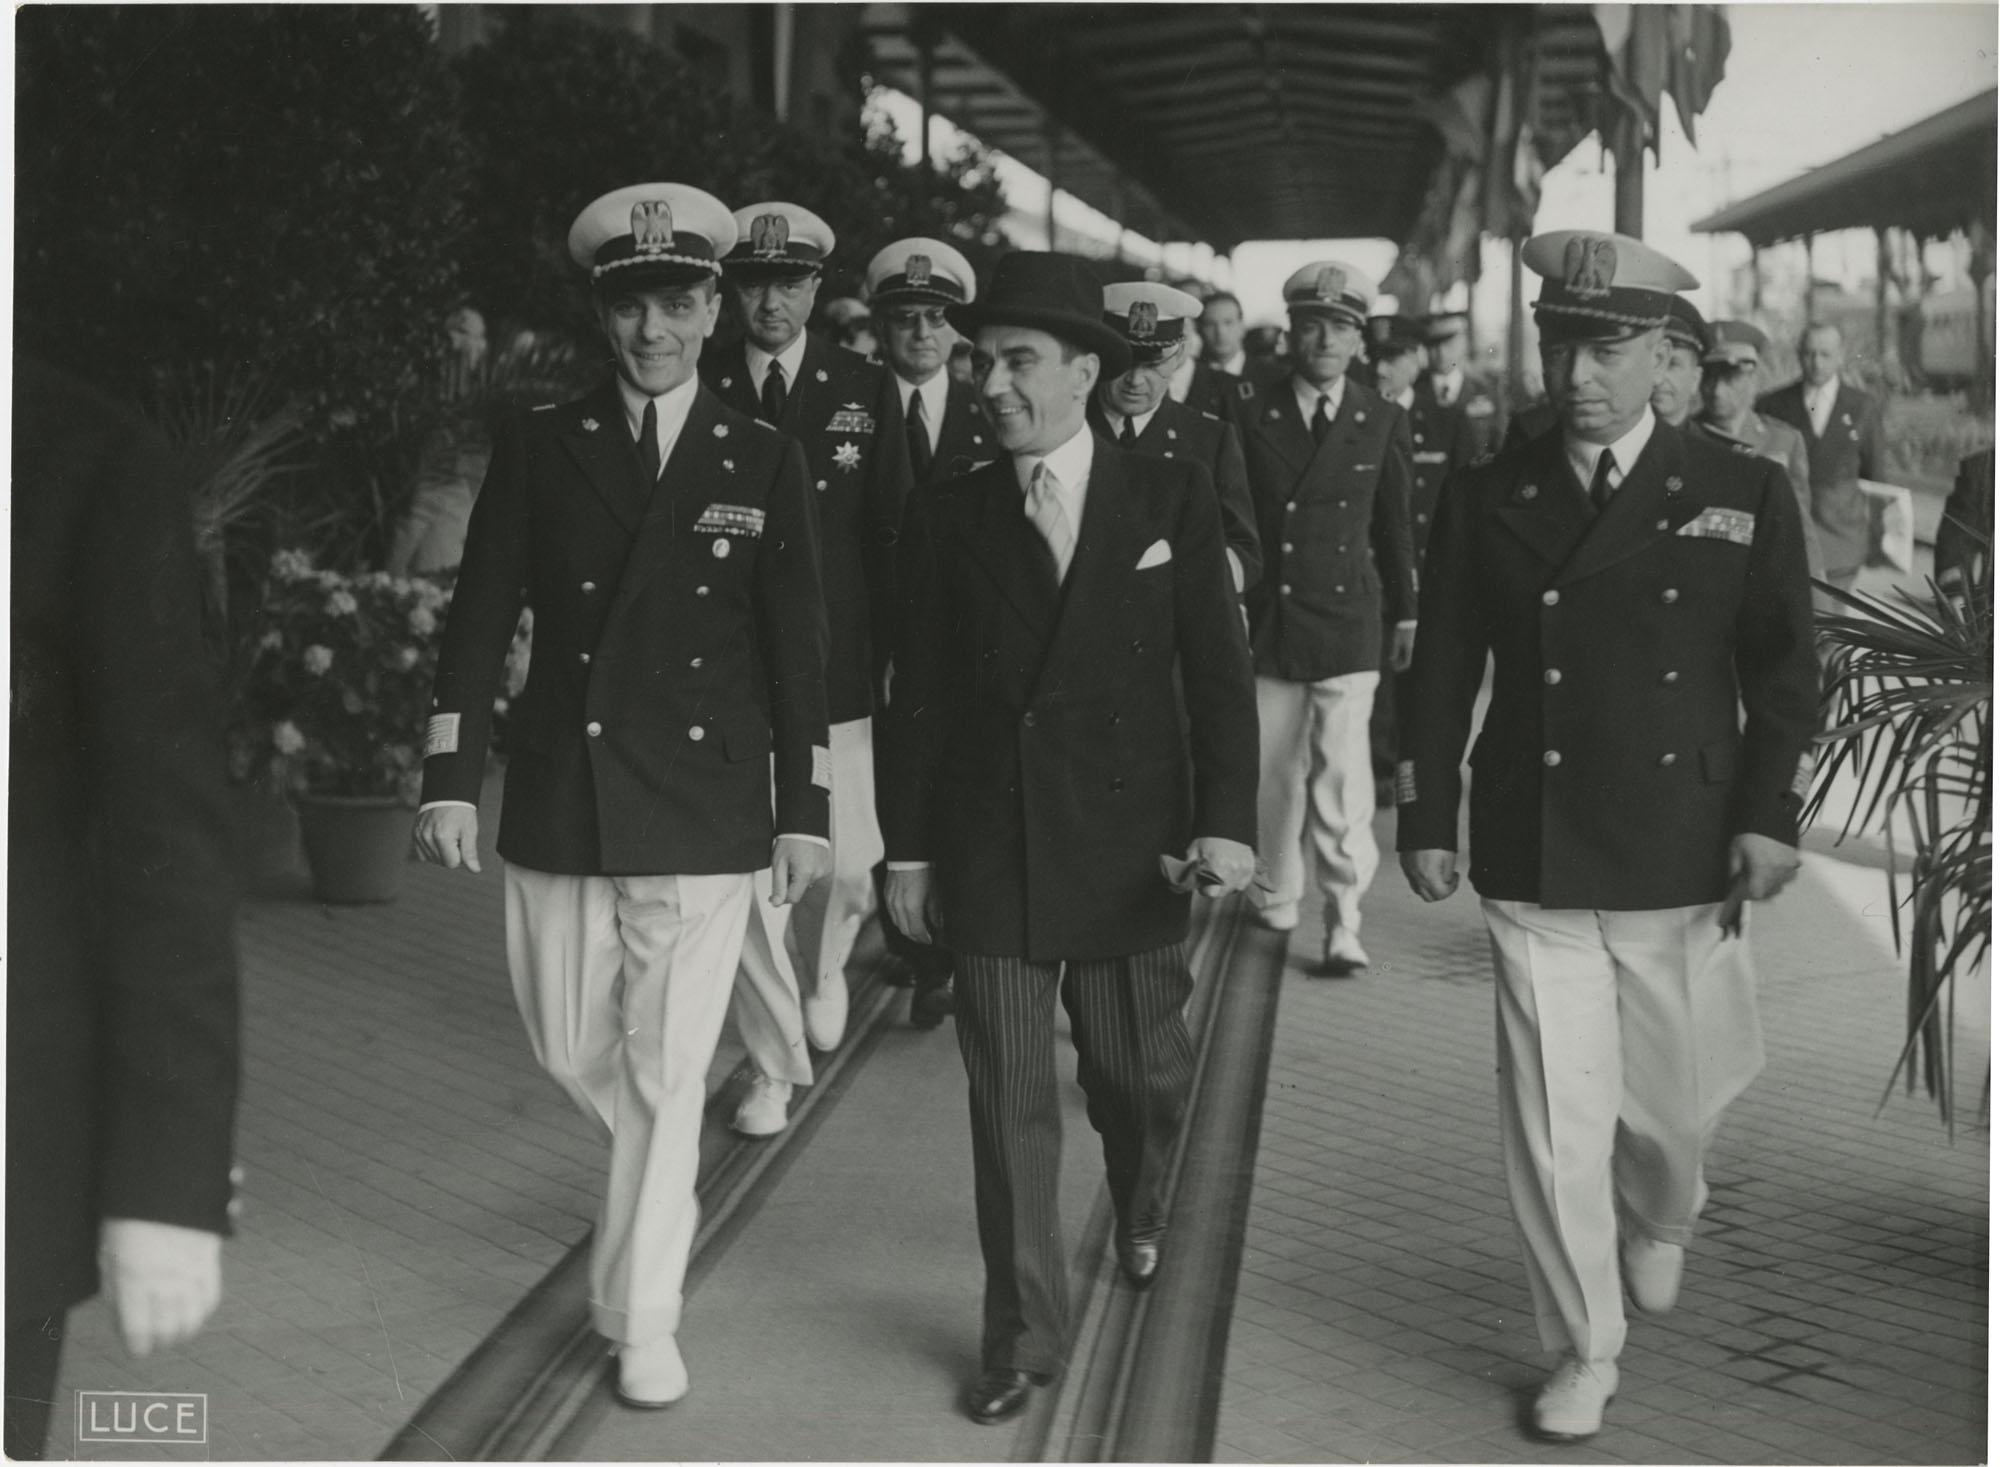 Mihai Antonescu's visit to Benito Mussolini, Photograph 11